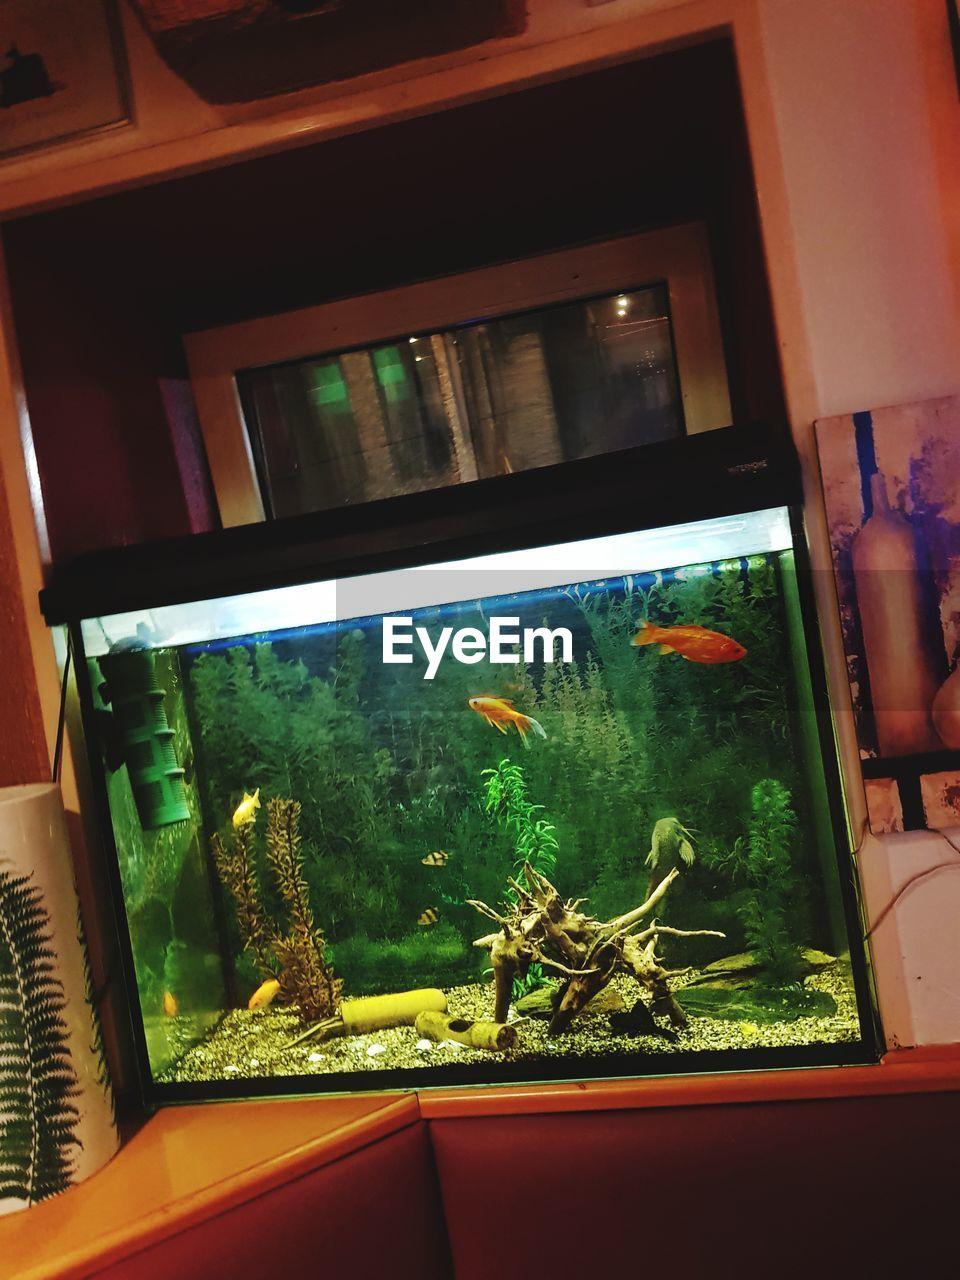 indoors, window, animal themes, no people, home interior, animals in the wild, close-up, animal wildlife, reptile, aquarium, nature, day